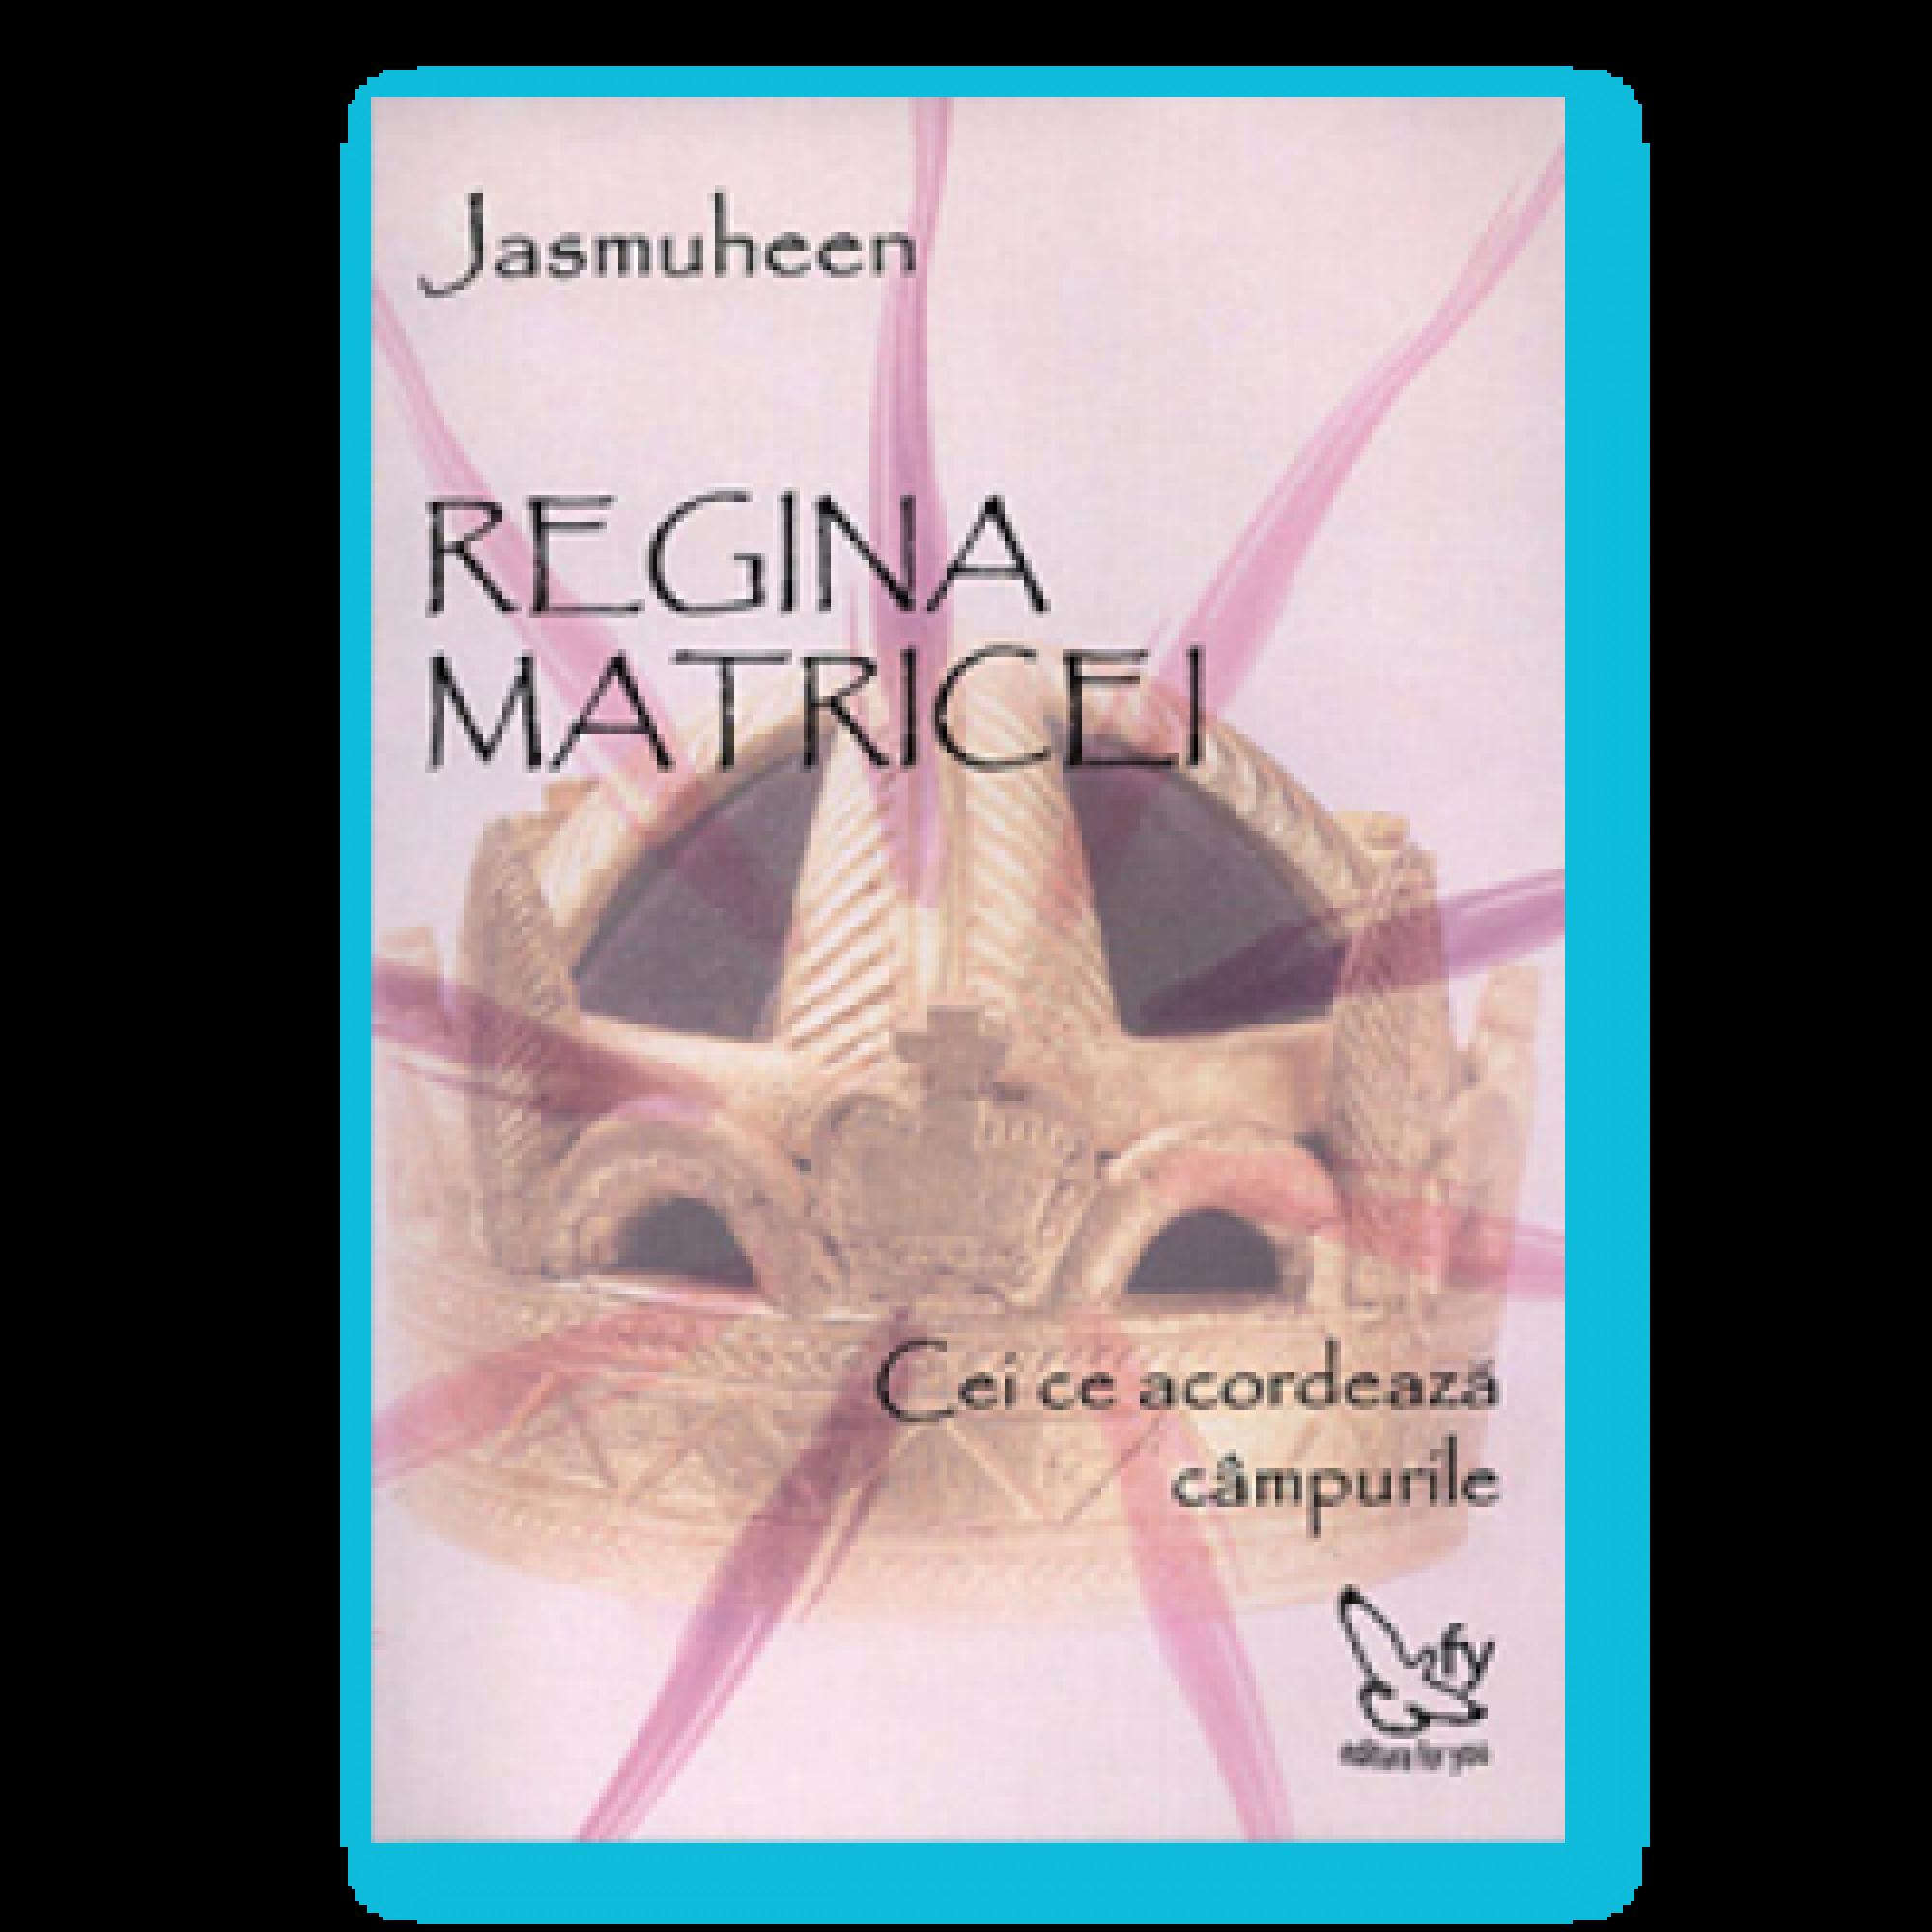 Regina matricei; Jasmuheen